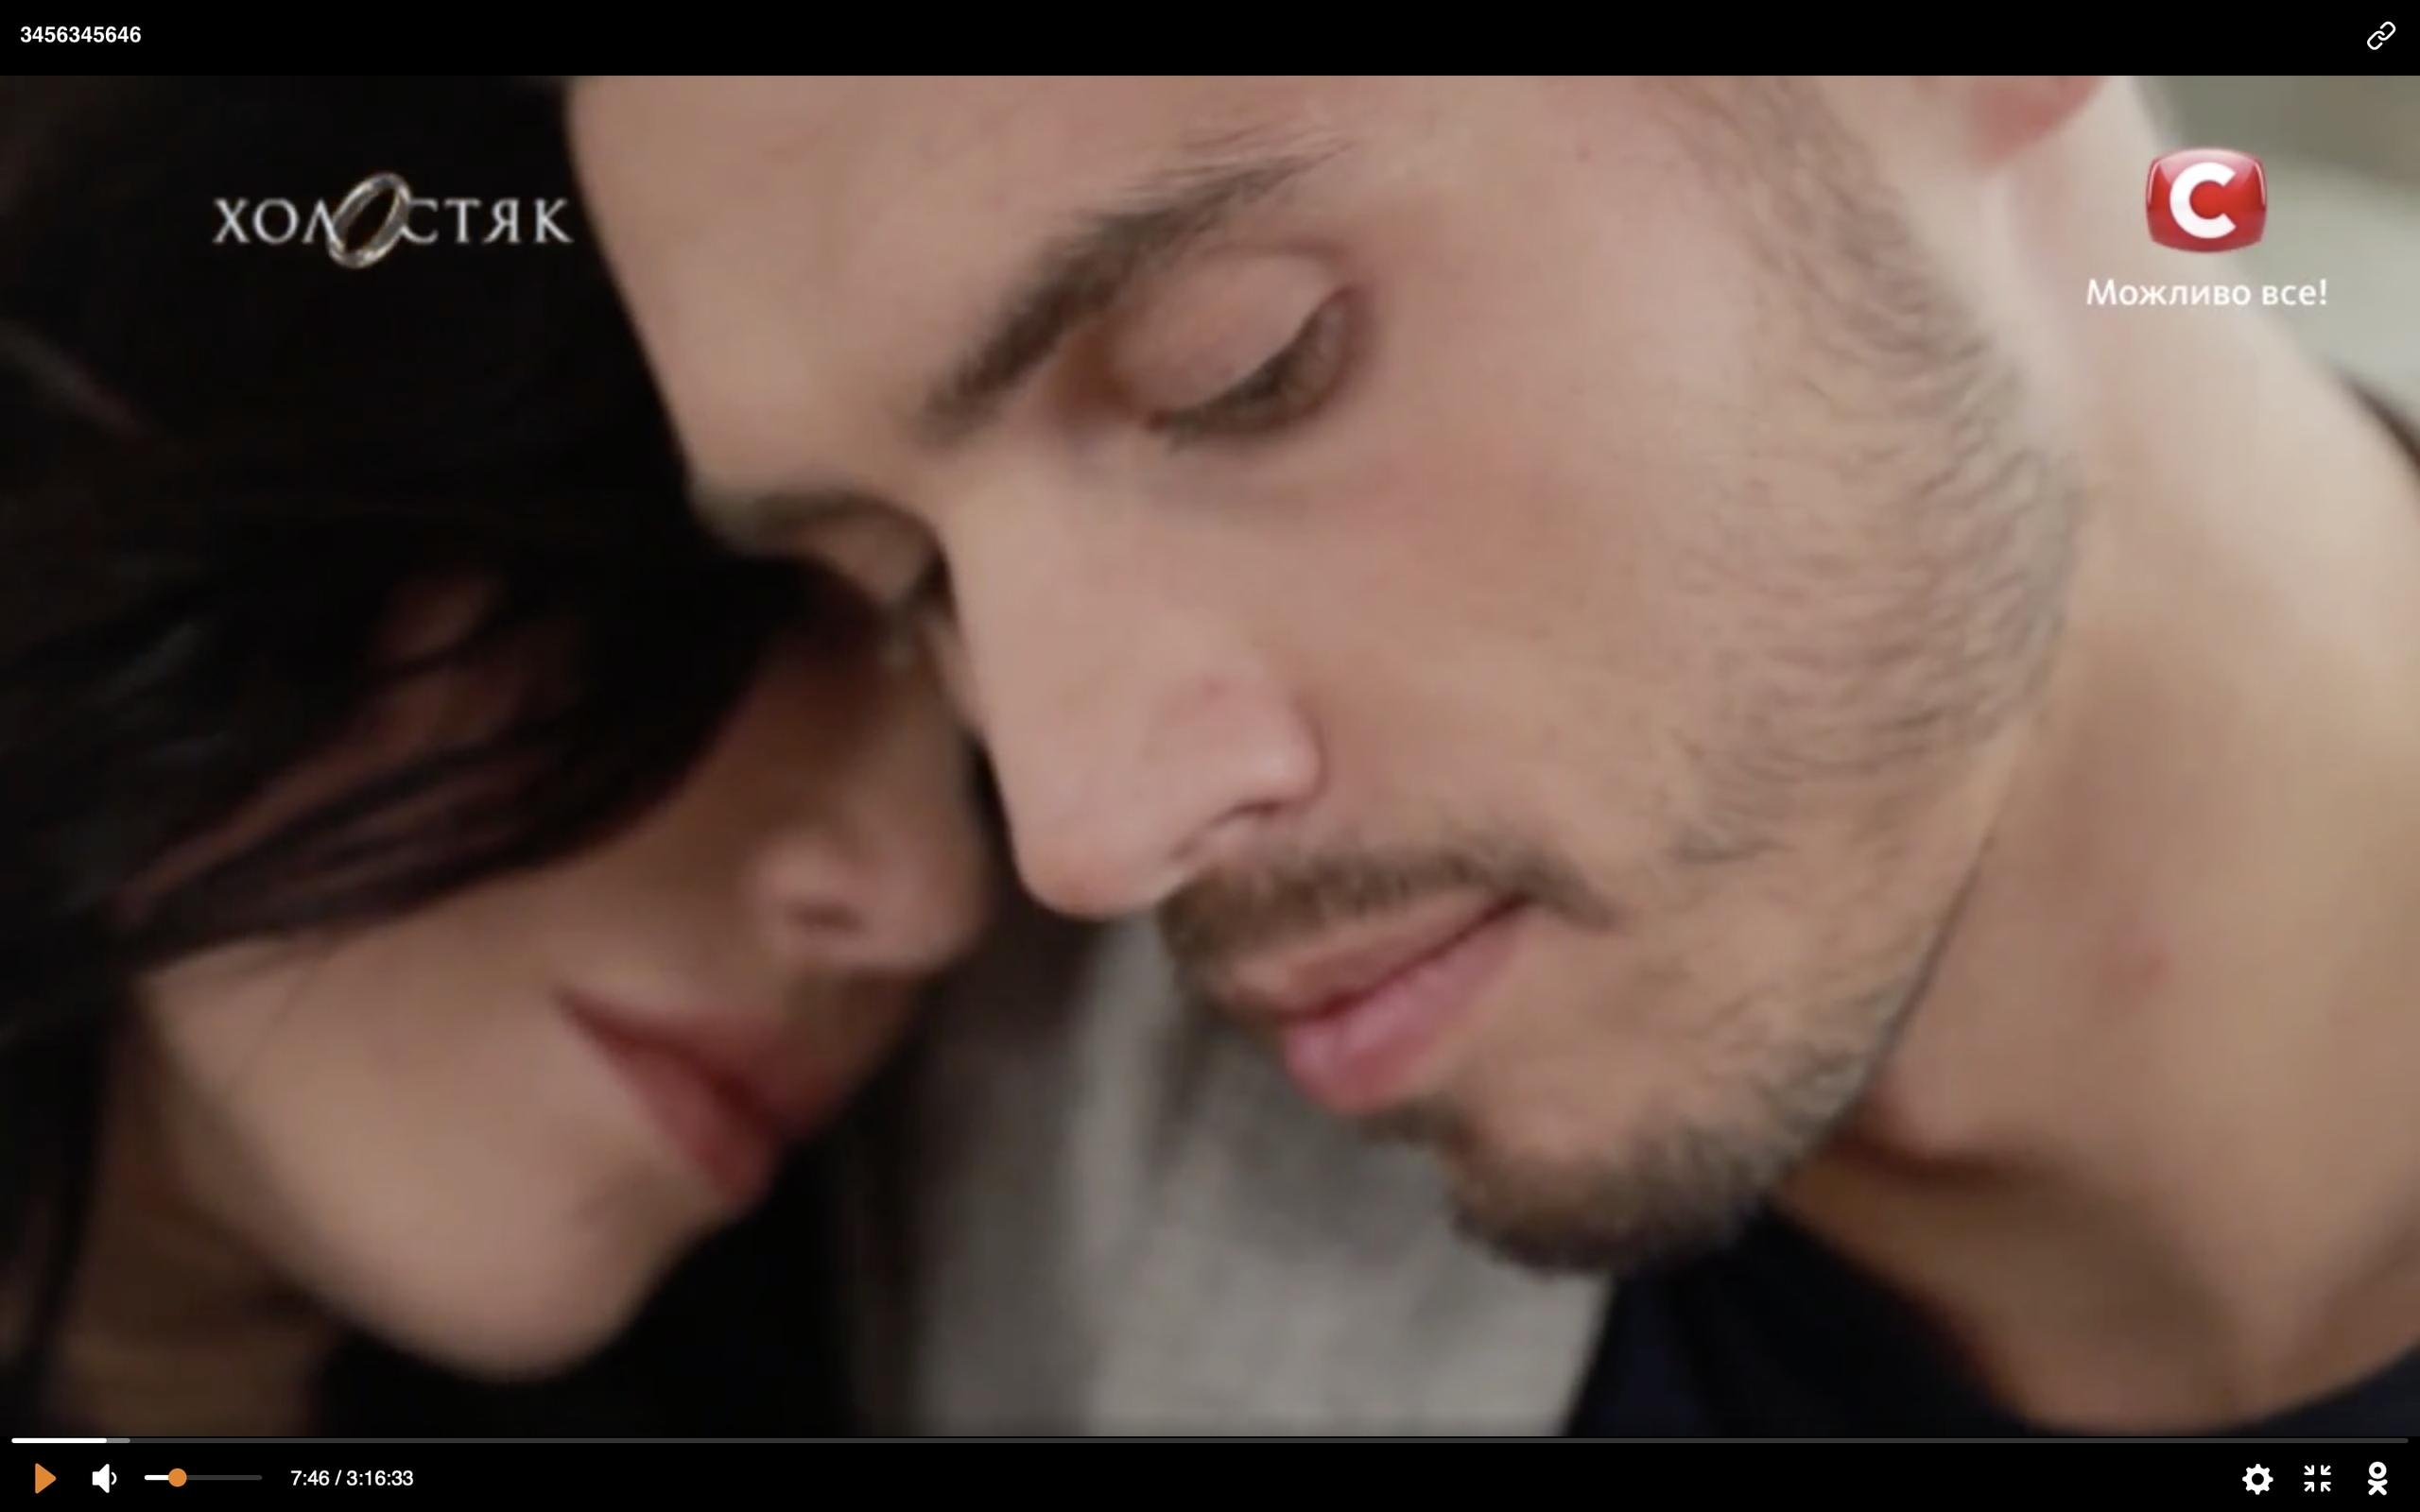 Bachelor Ukraine - Season 9 - Nikita Dobrynin - *Sleuthing Spoilers* - Page 10 BMtXv0Pc5b0